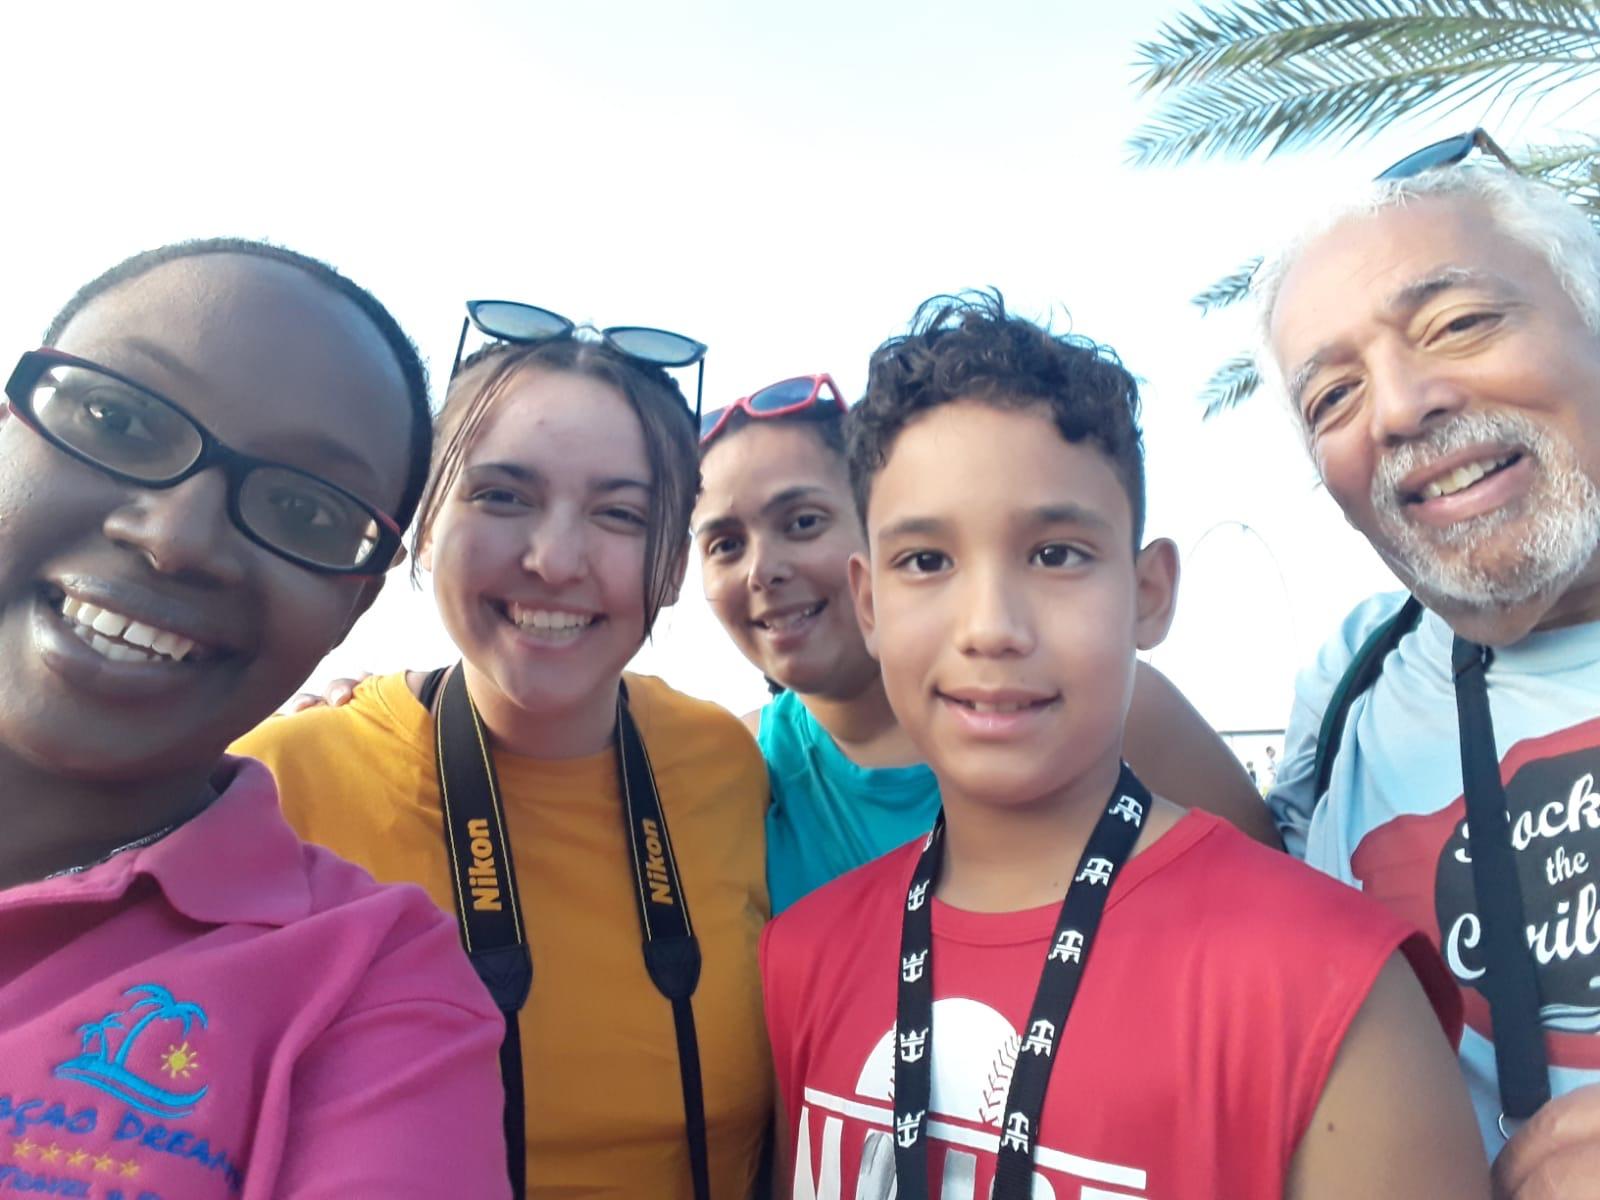 Curacao-Dreams-Travel-team